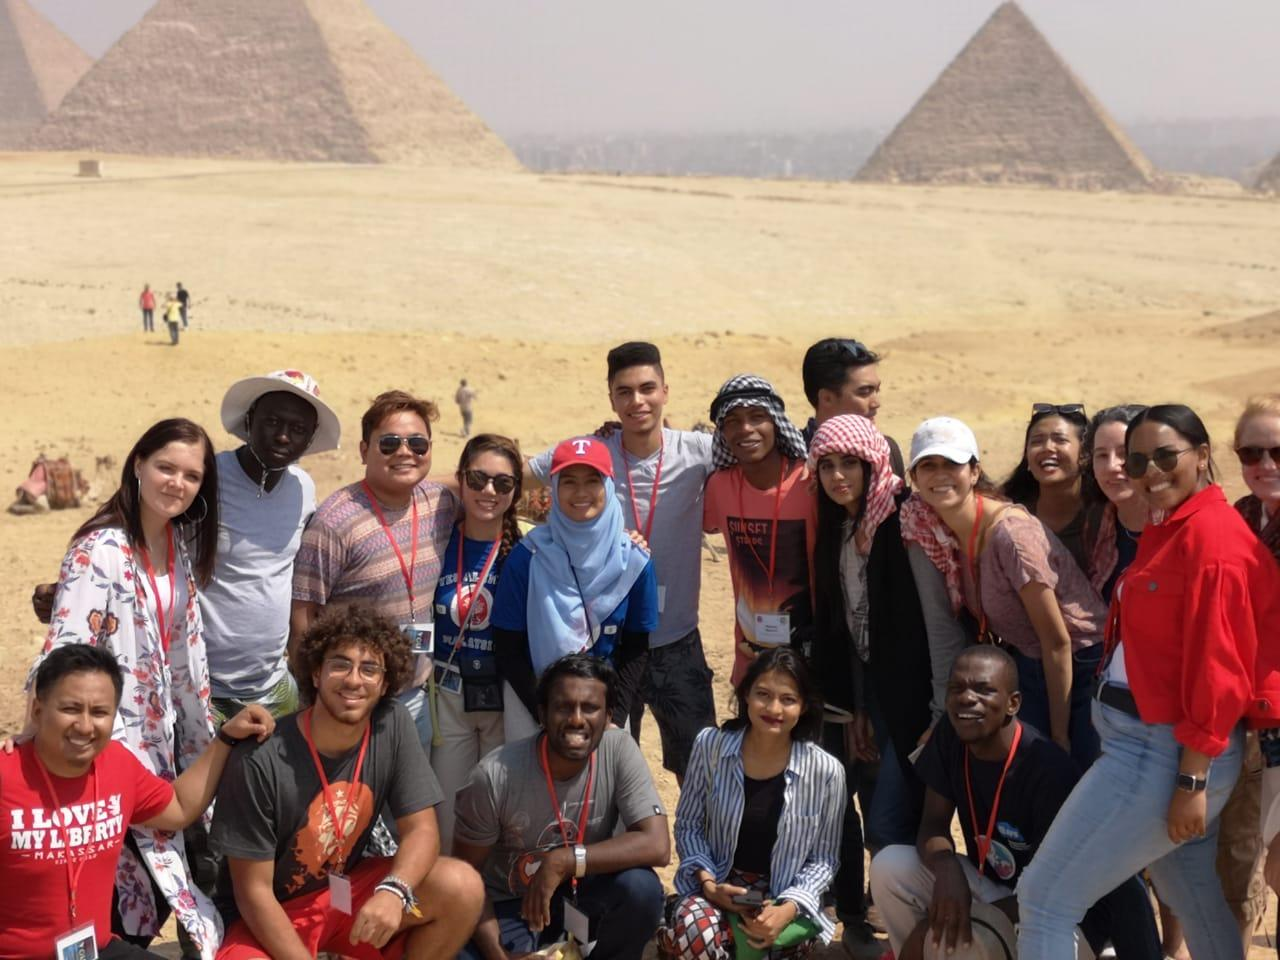 Moniques Pic Group Pyramids